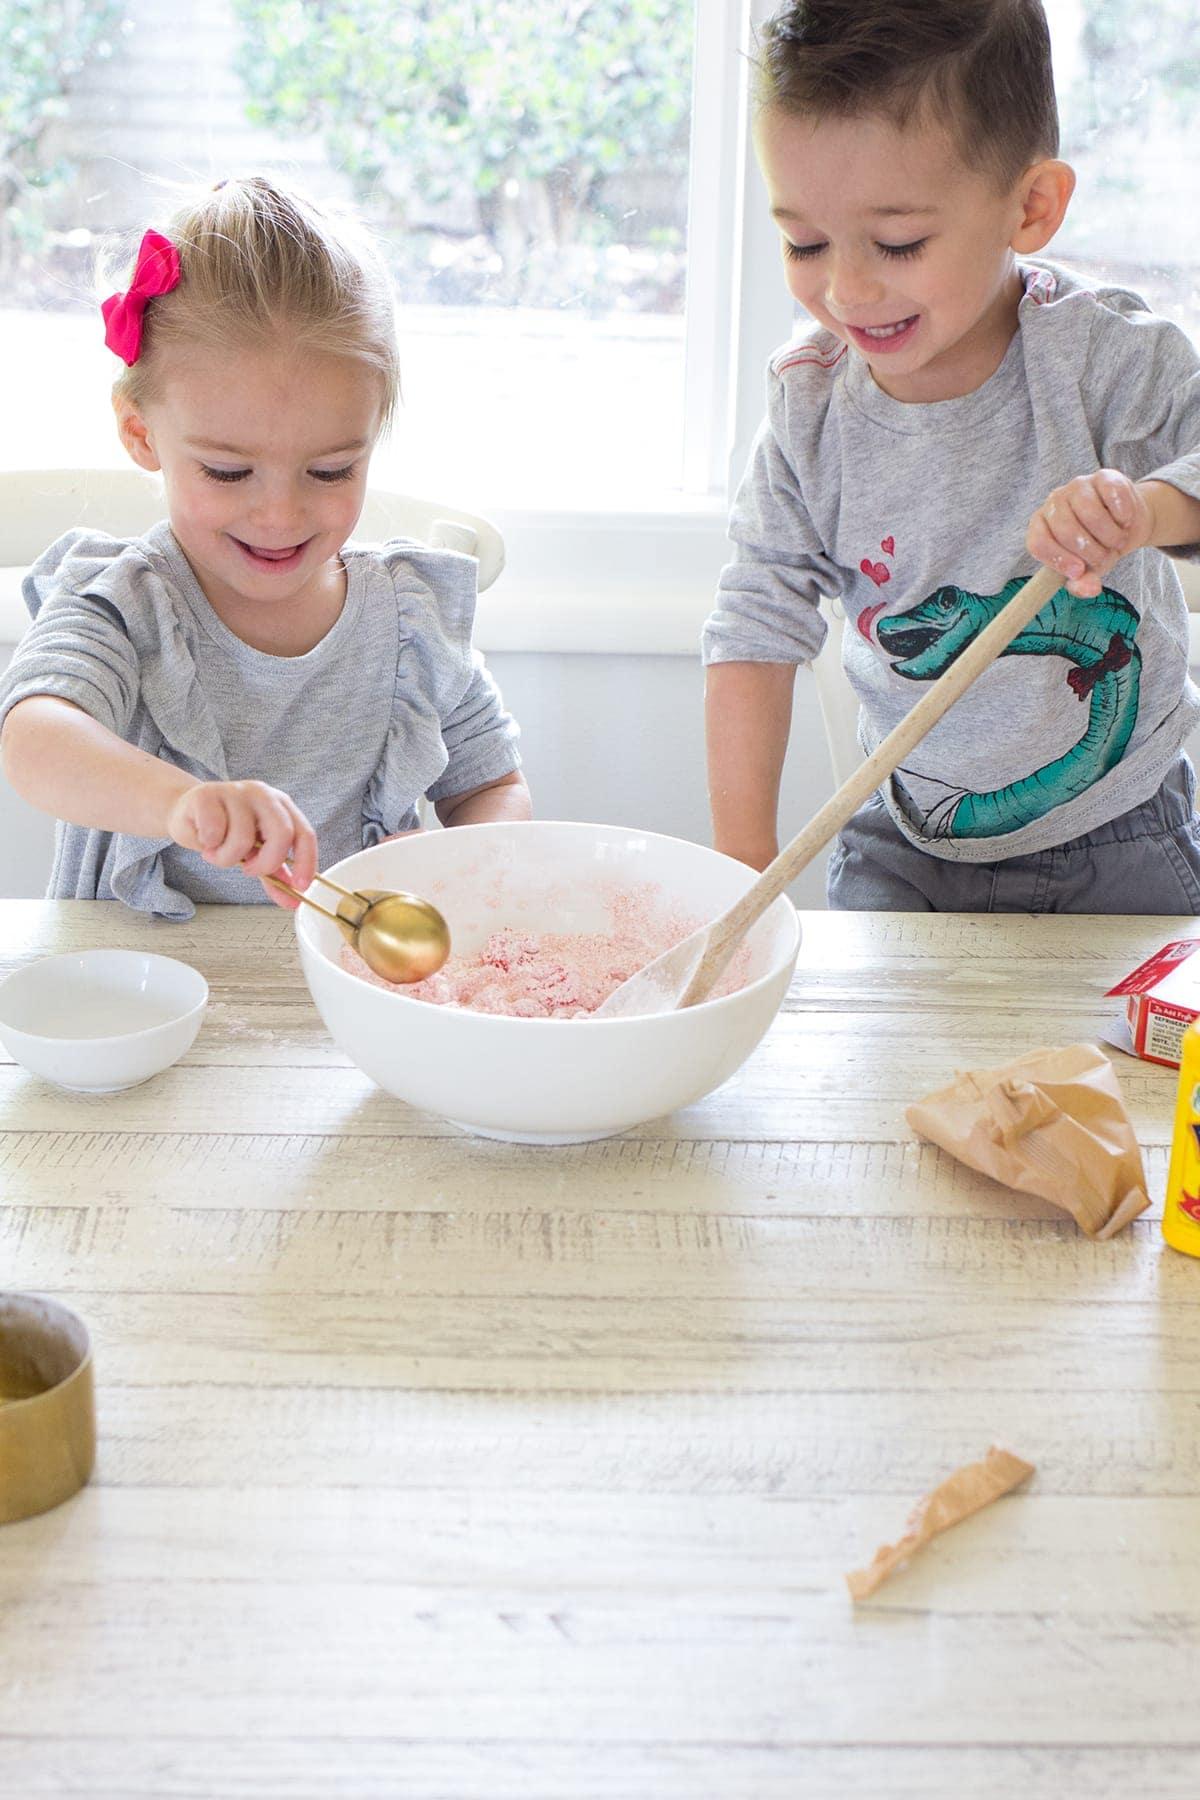 Three Ingredient Edible Sensory Dough